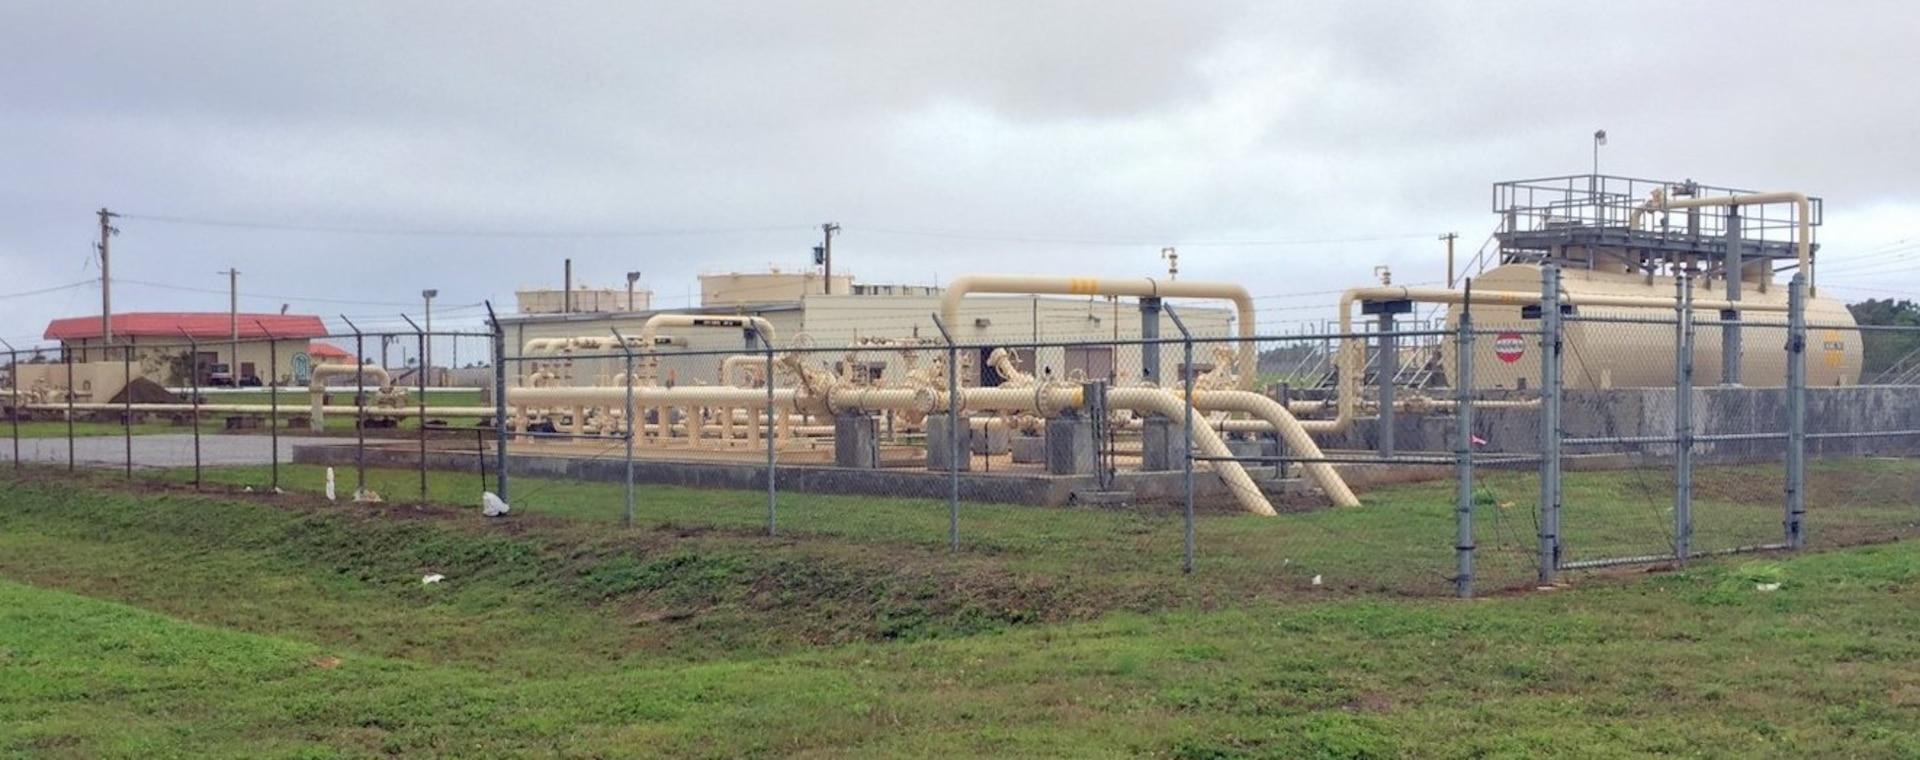 New pipeline revitalizes Guam fuel infrastructure